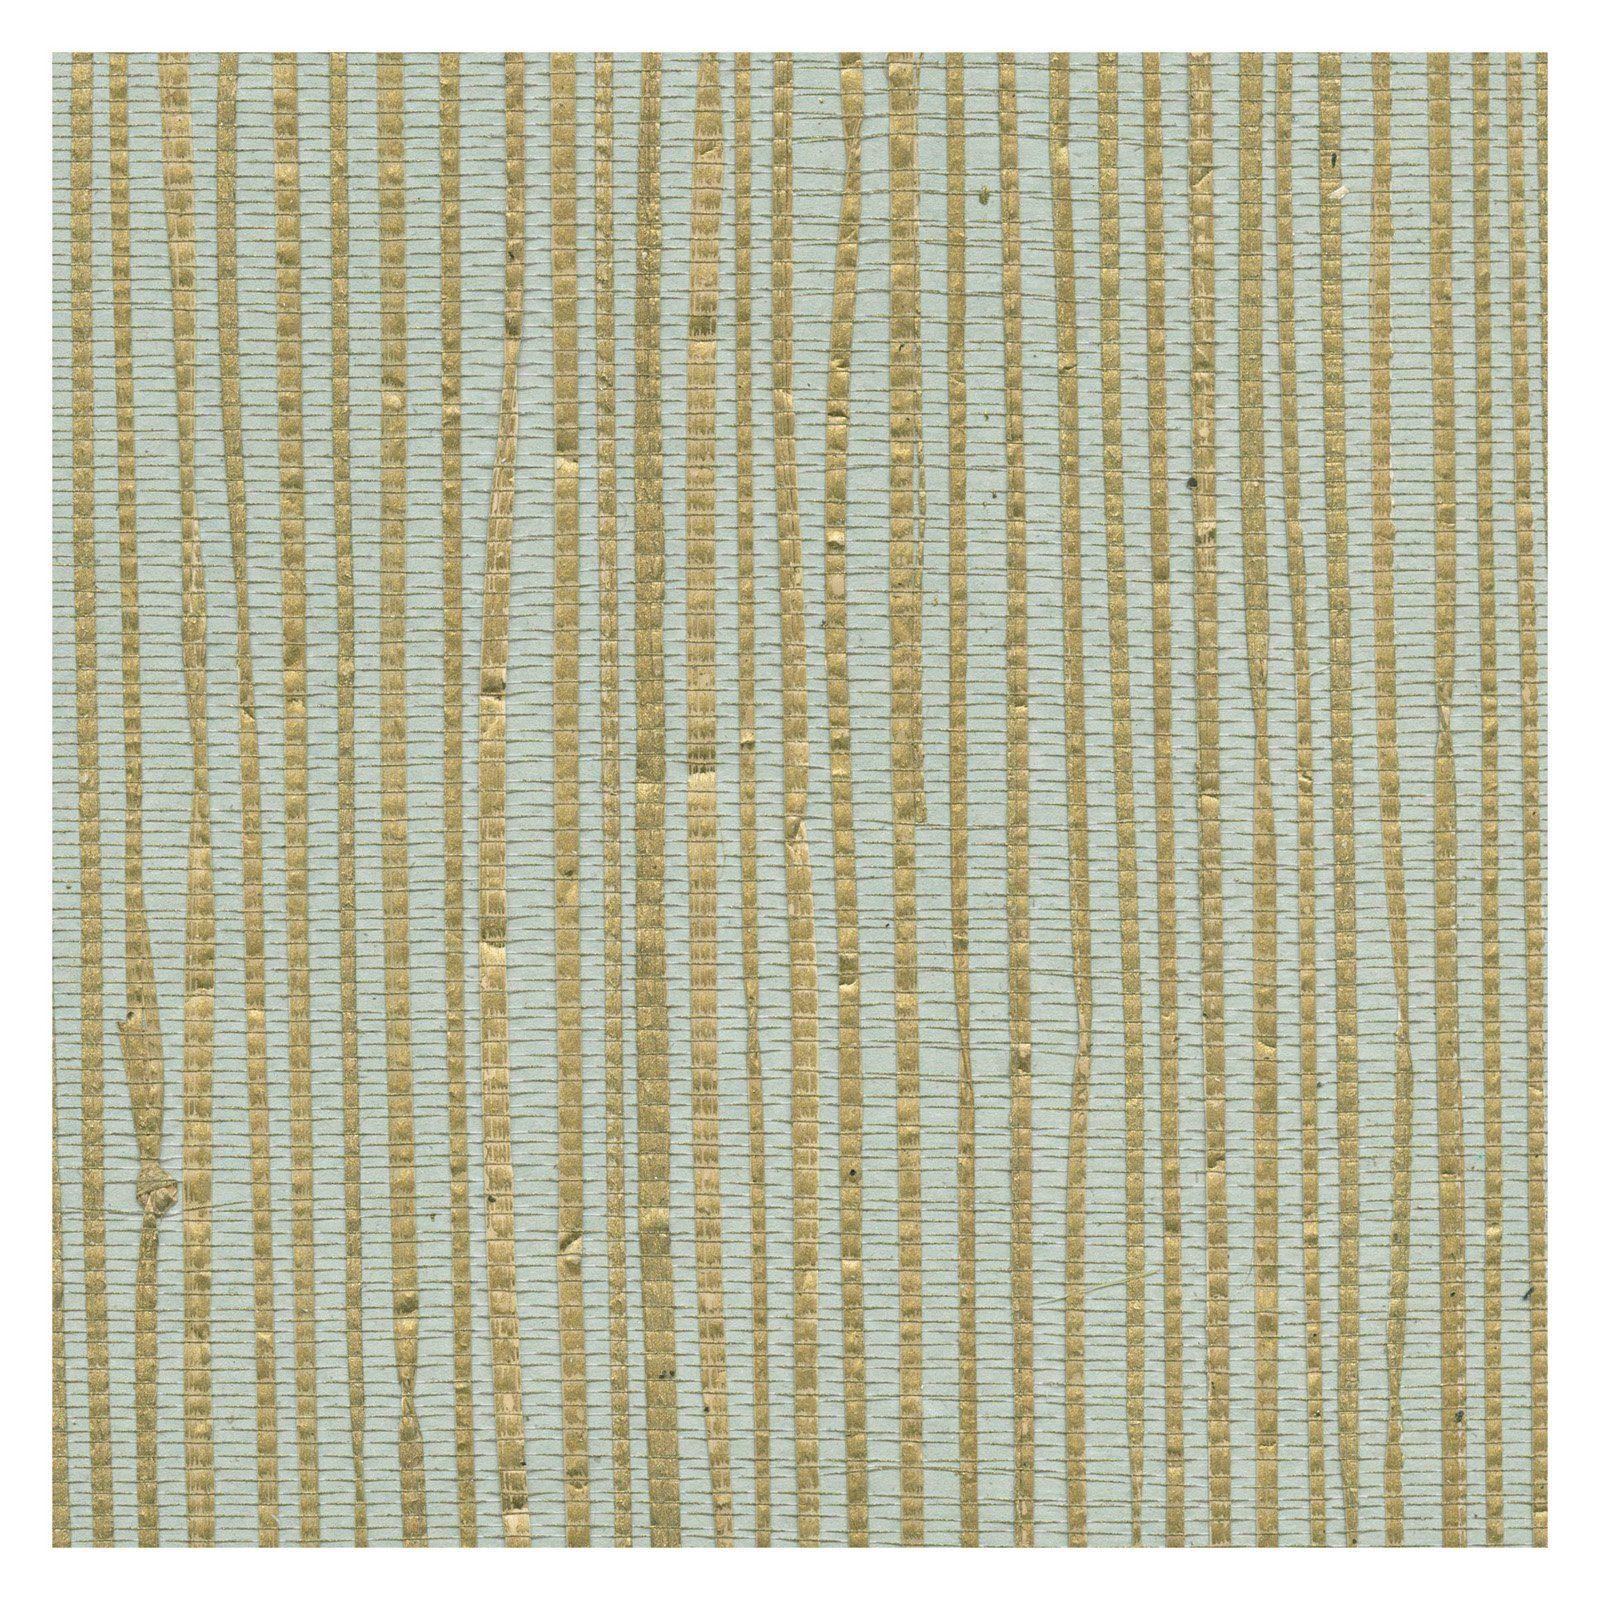 Kenneth James Arina Grasscloth Wallpaper | from hayneedle.com